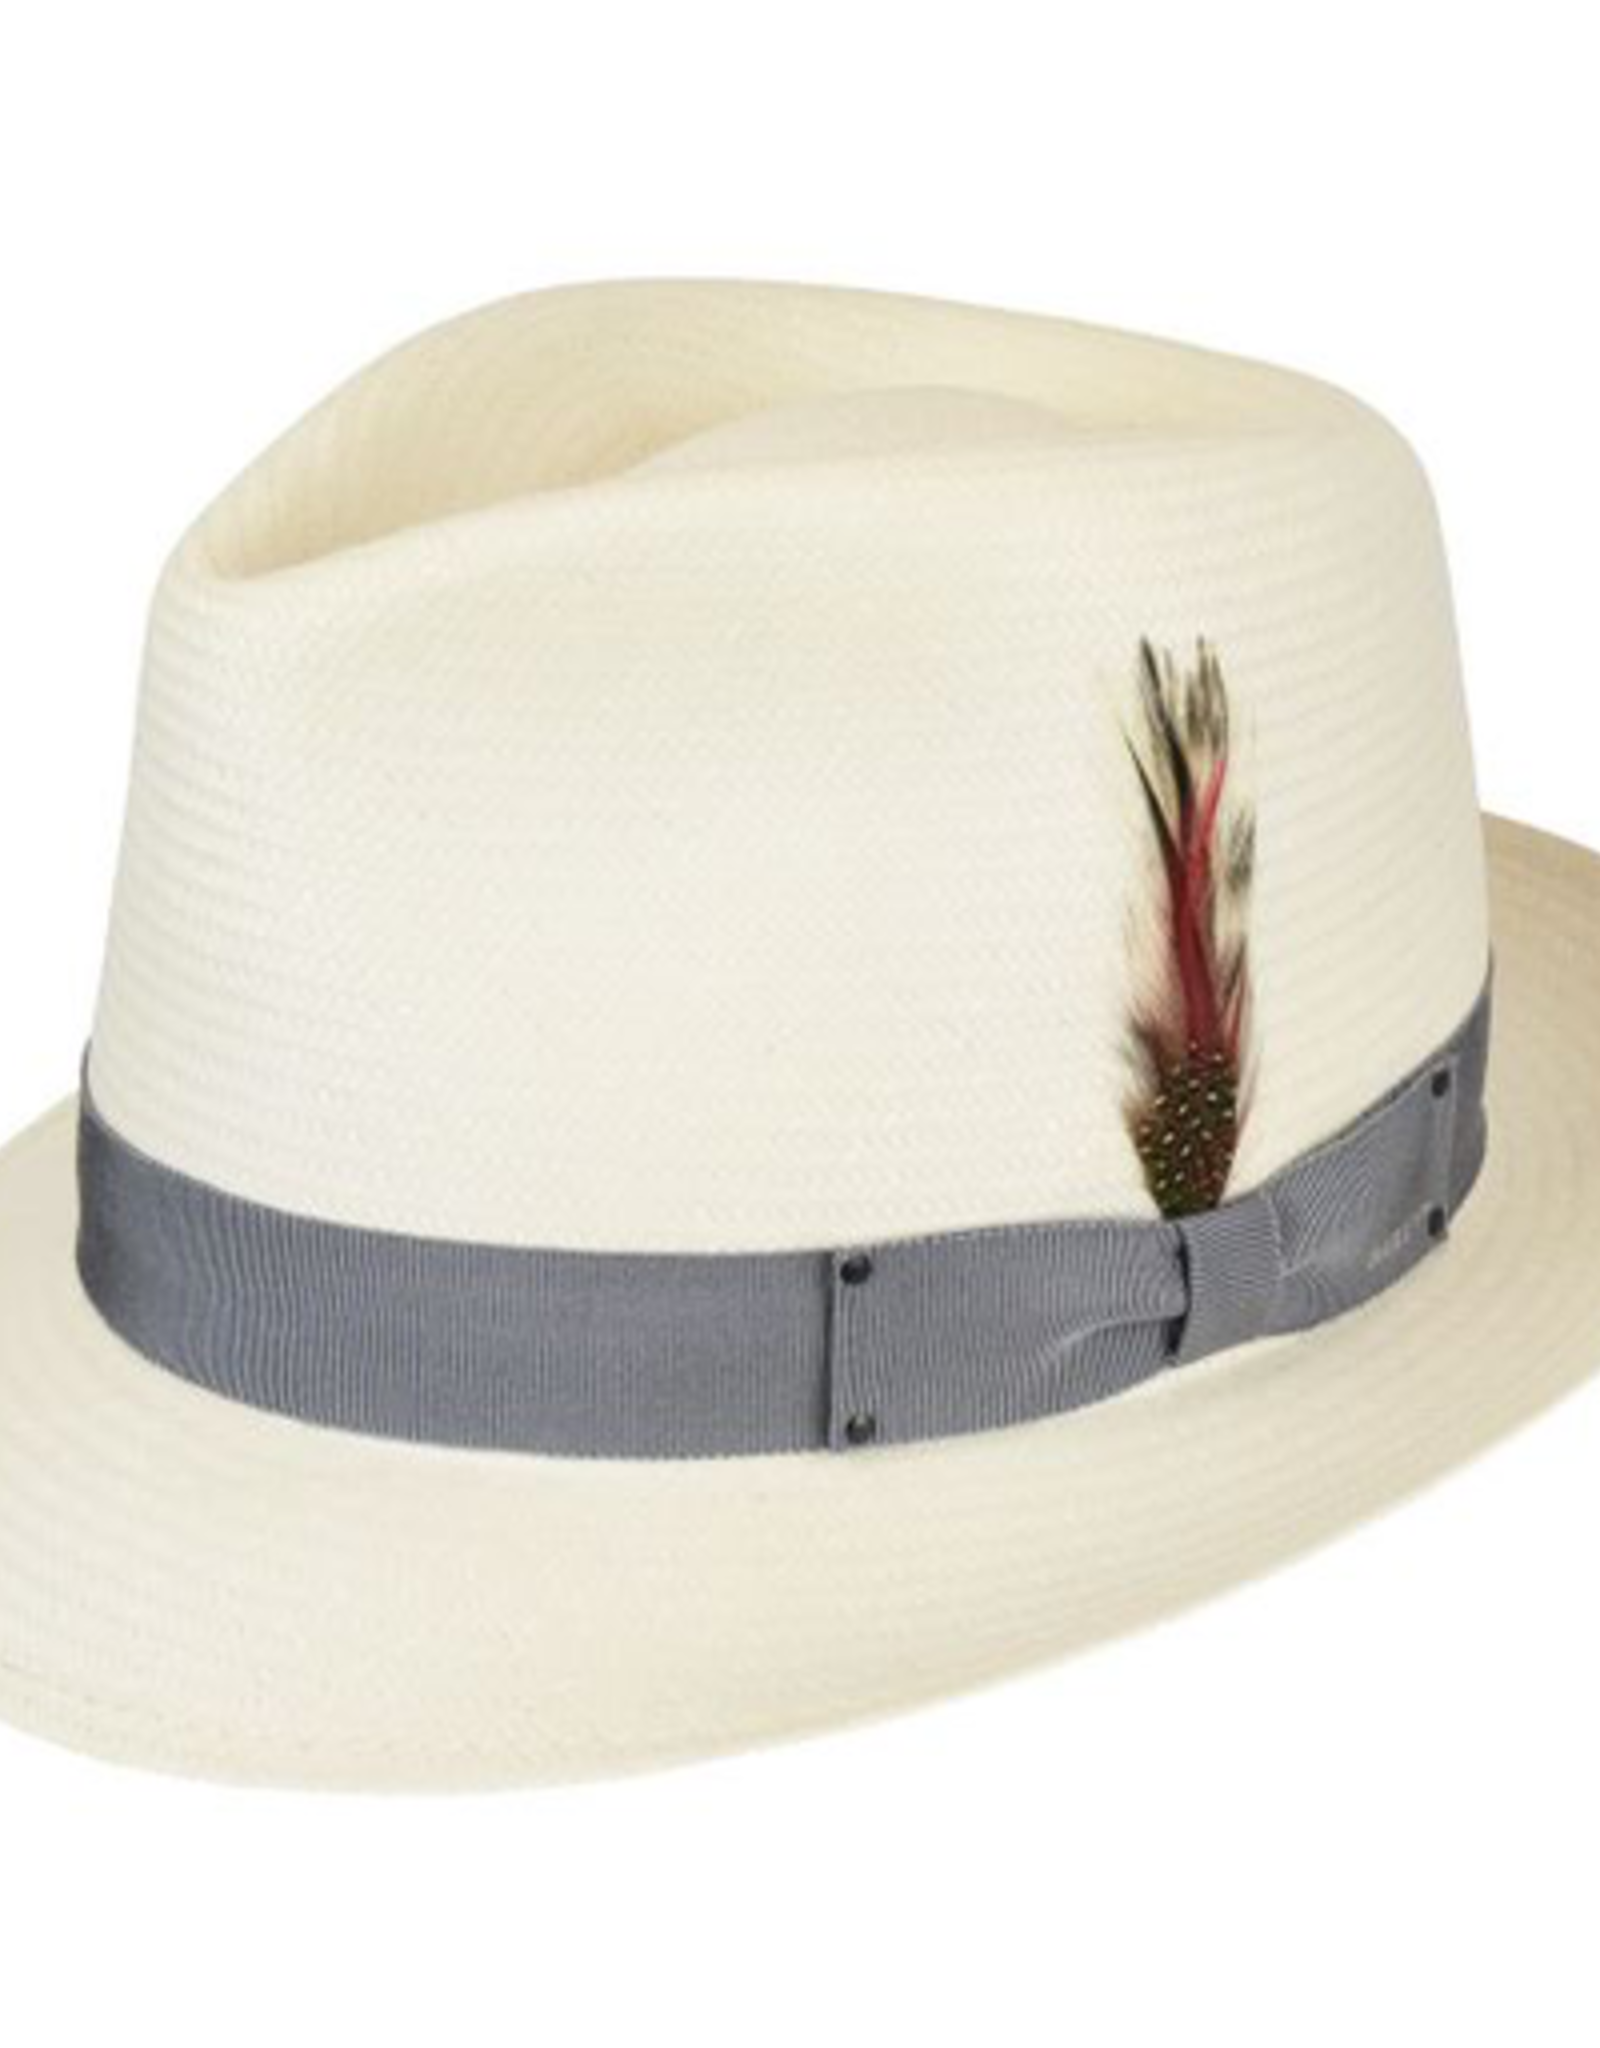 Bailey Hat Co. HAT-FEDORA-GUTHRIE, SHANTUNG STRAW